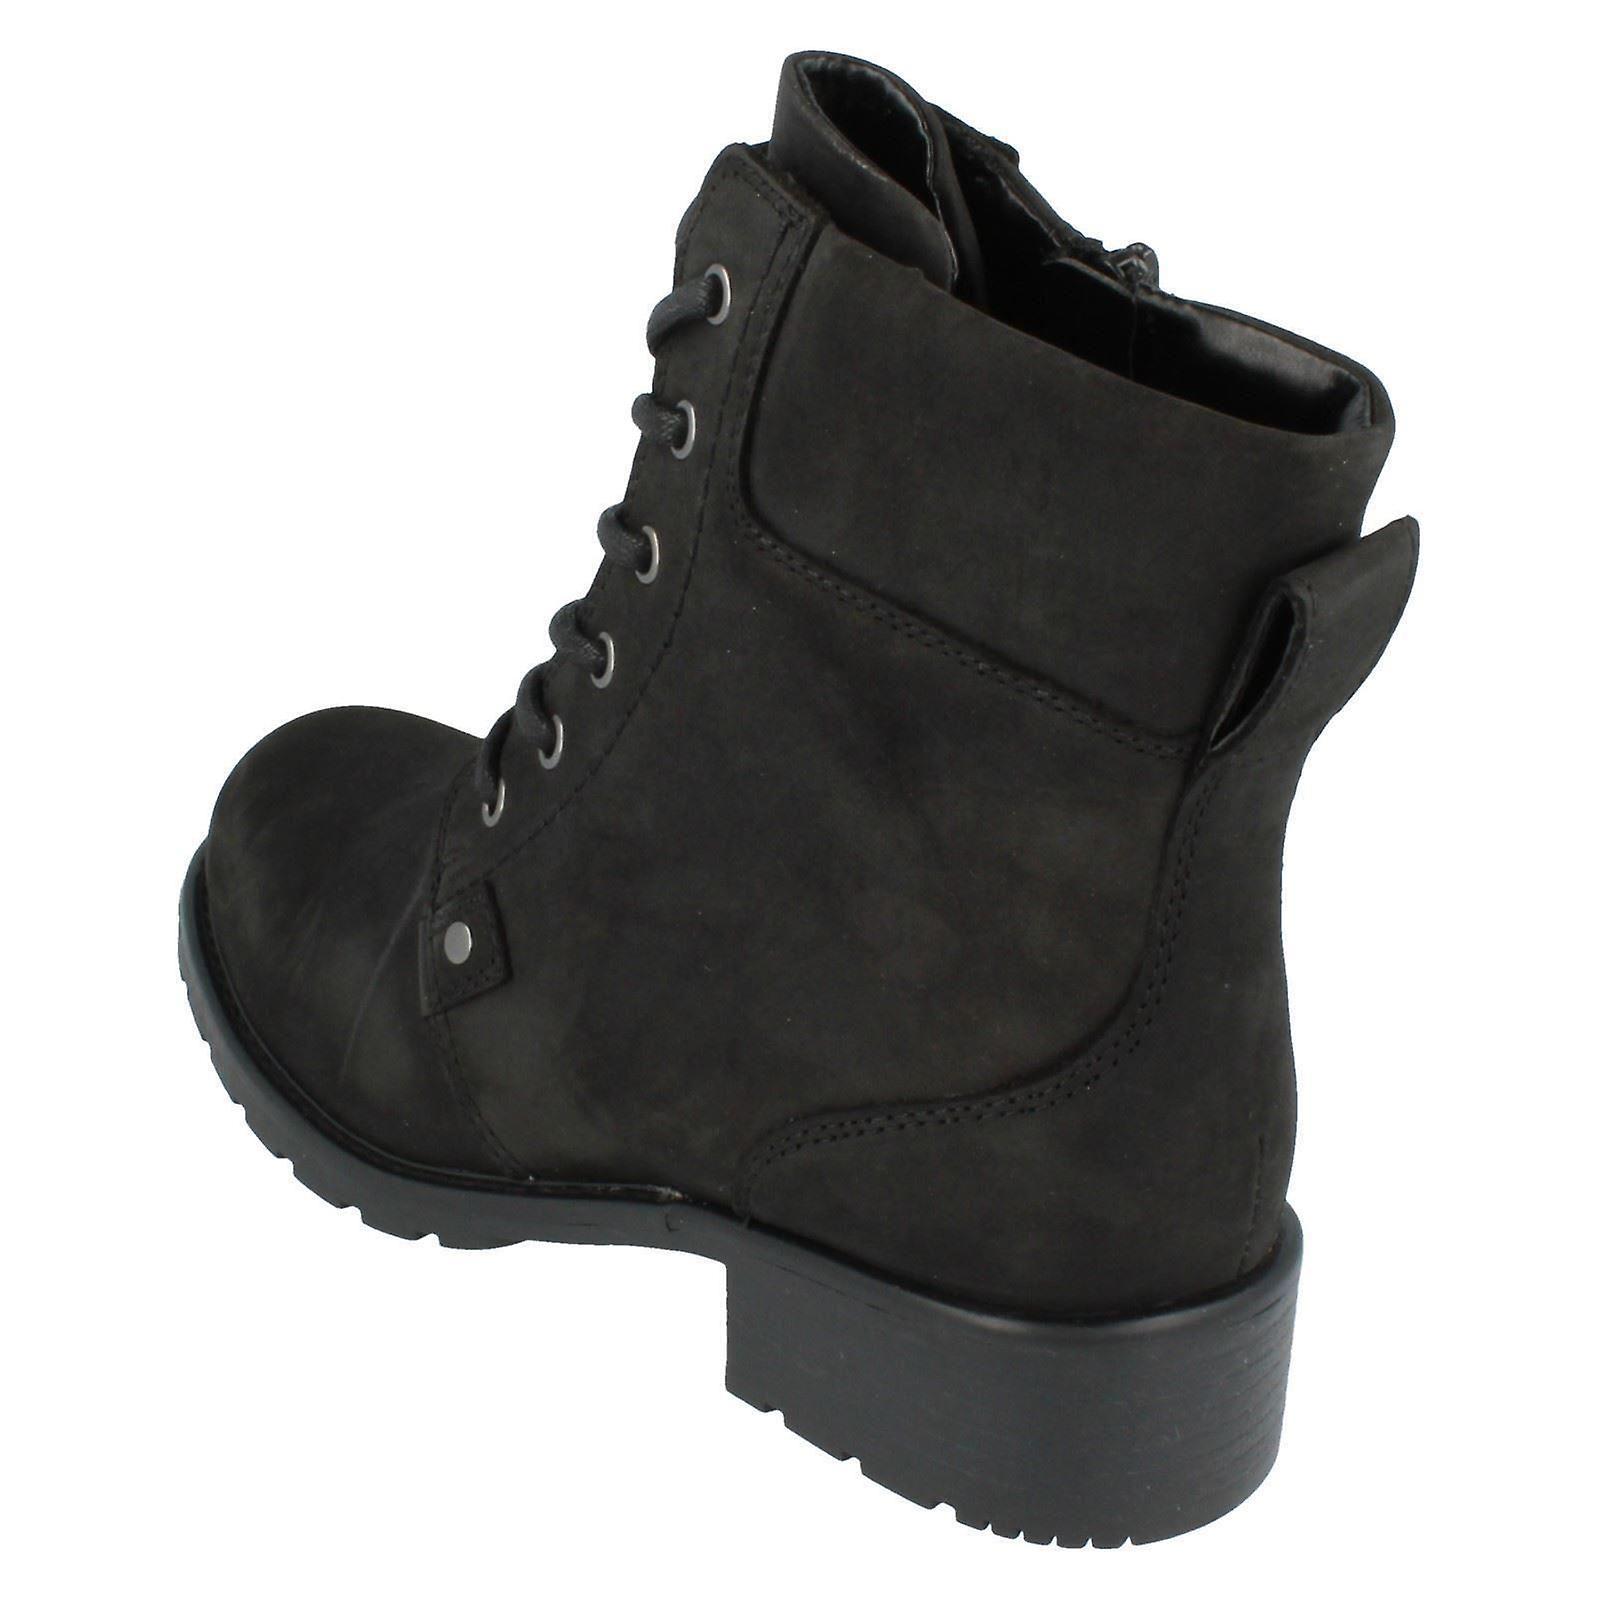 00e996d0 Ladies Clarks Ankle Boots Orinoco Spice